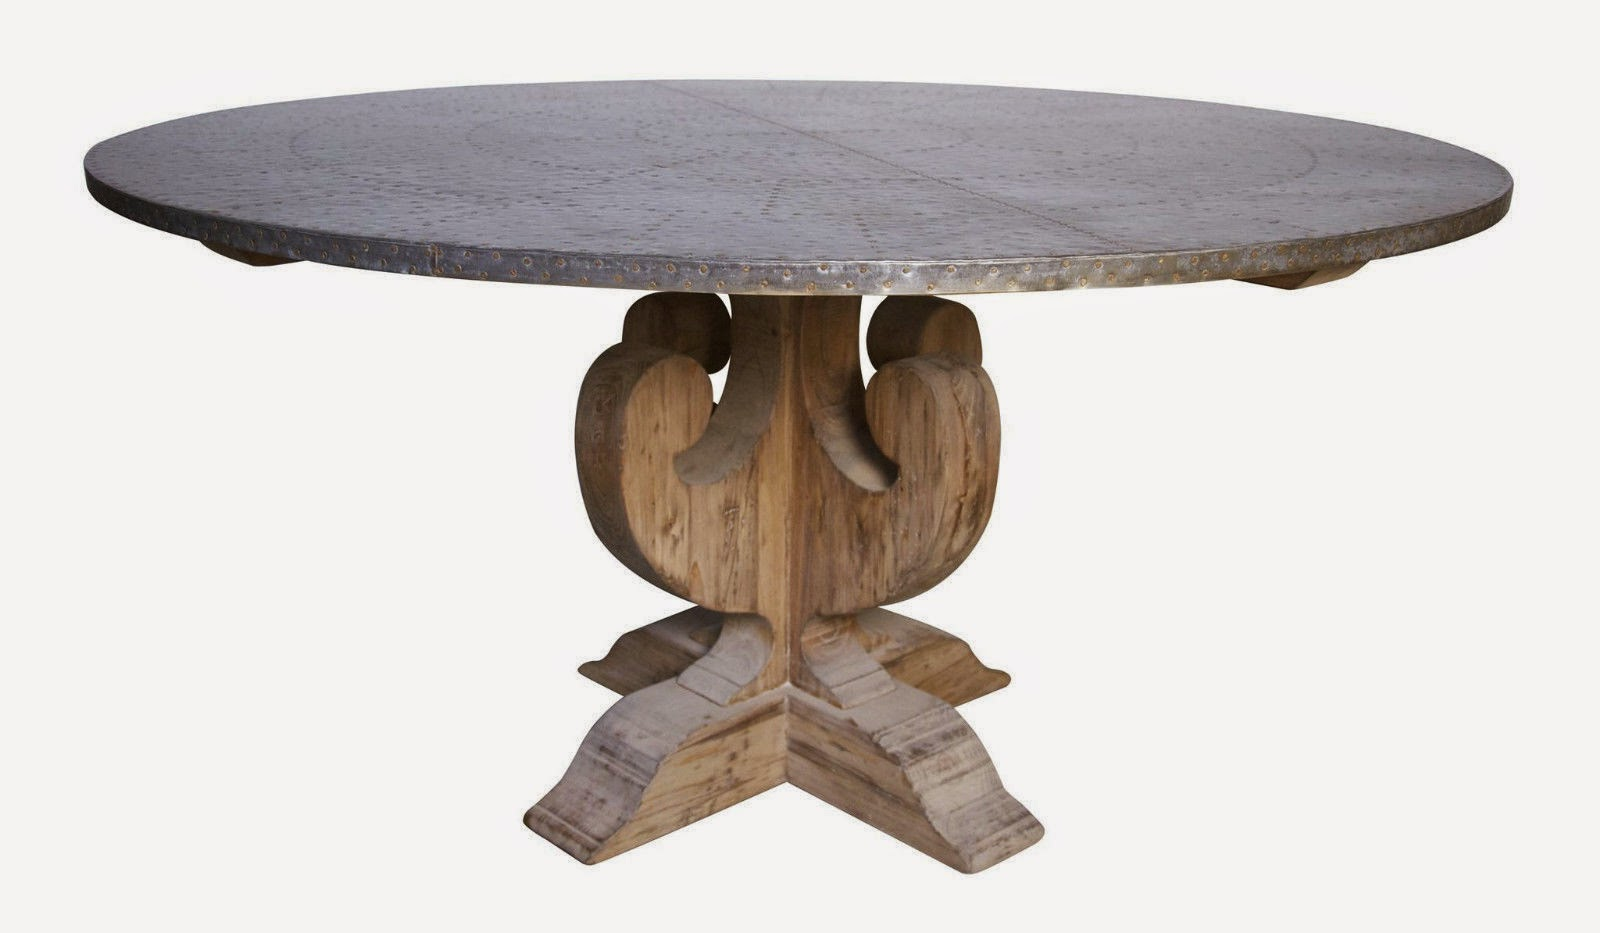 60 Round Dining Table Pine Wood Zinc